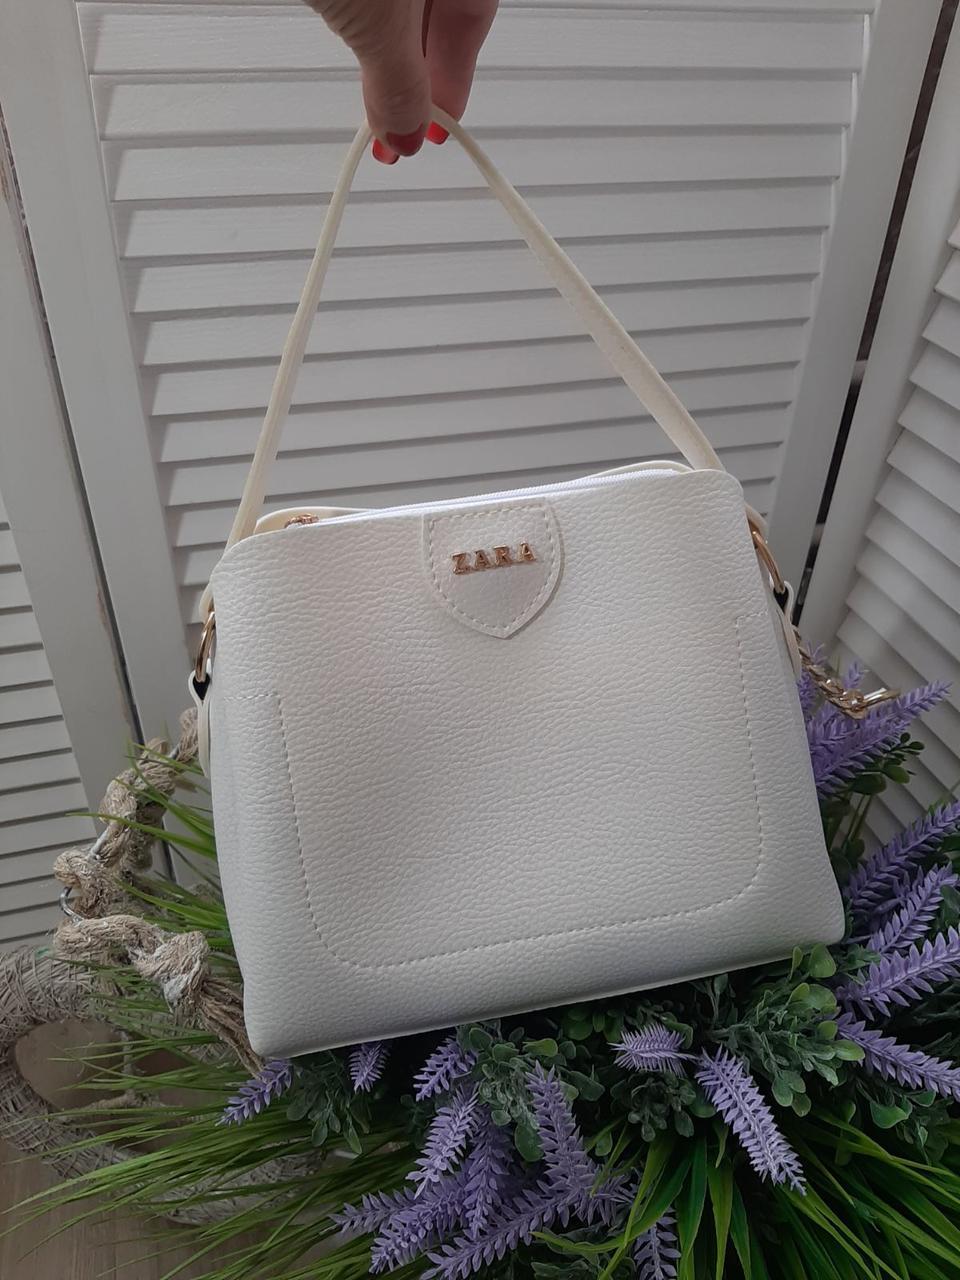 Маленька біла жіноча сумка невелика класична сумочка через плече кожзам